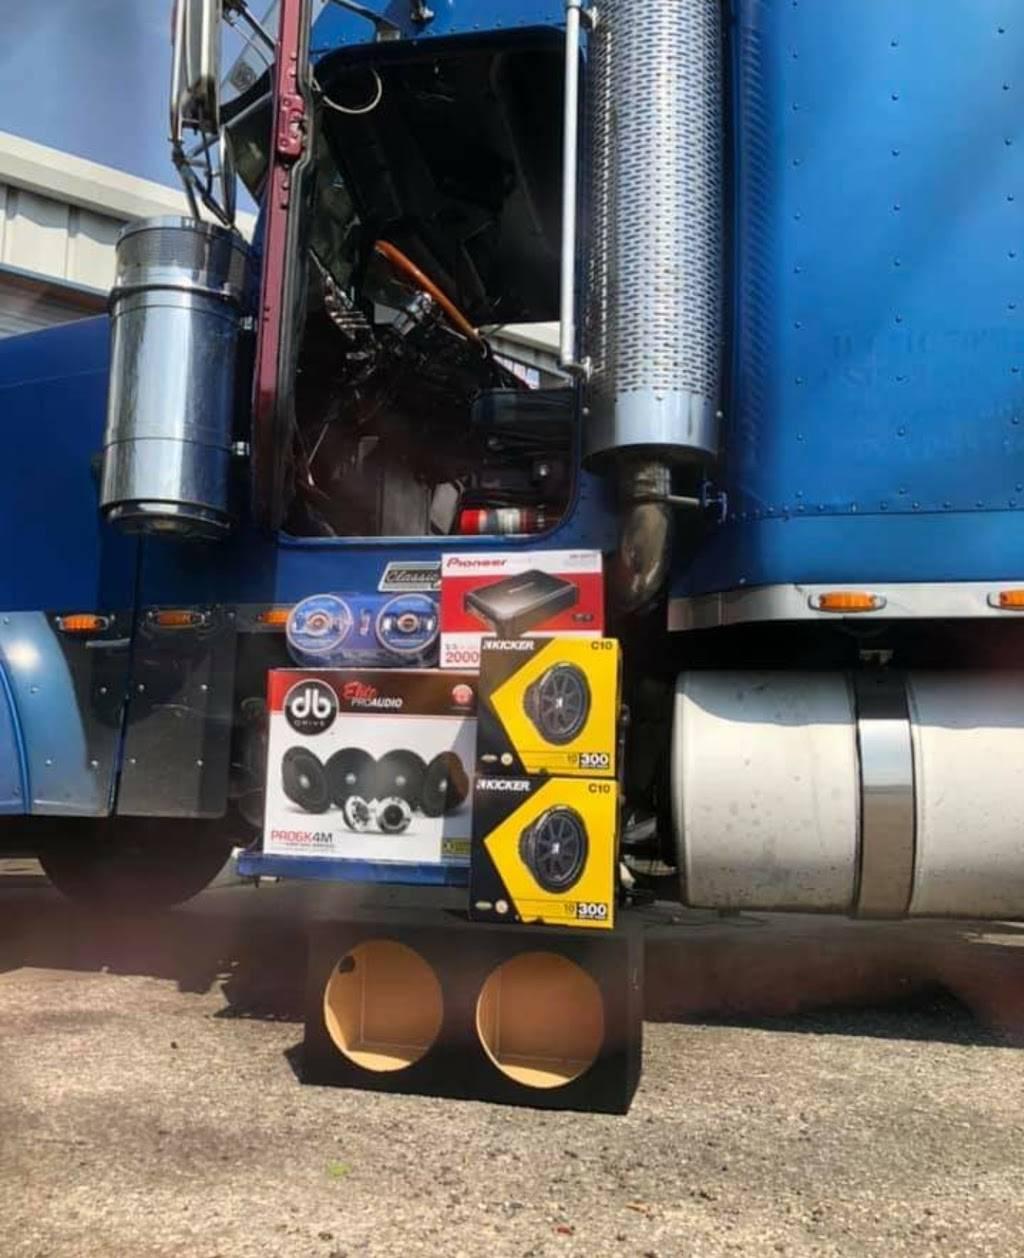 Flow Customs - electronics store  | Photo 1 of 6 | Address: 6030 Causeway Blvd, Tampa, FL 33619, USA | Phone: (813) 203-5974